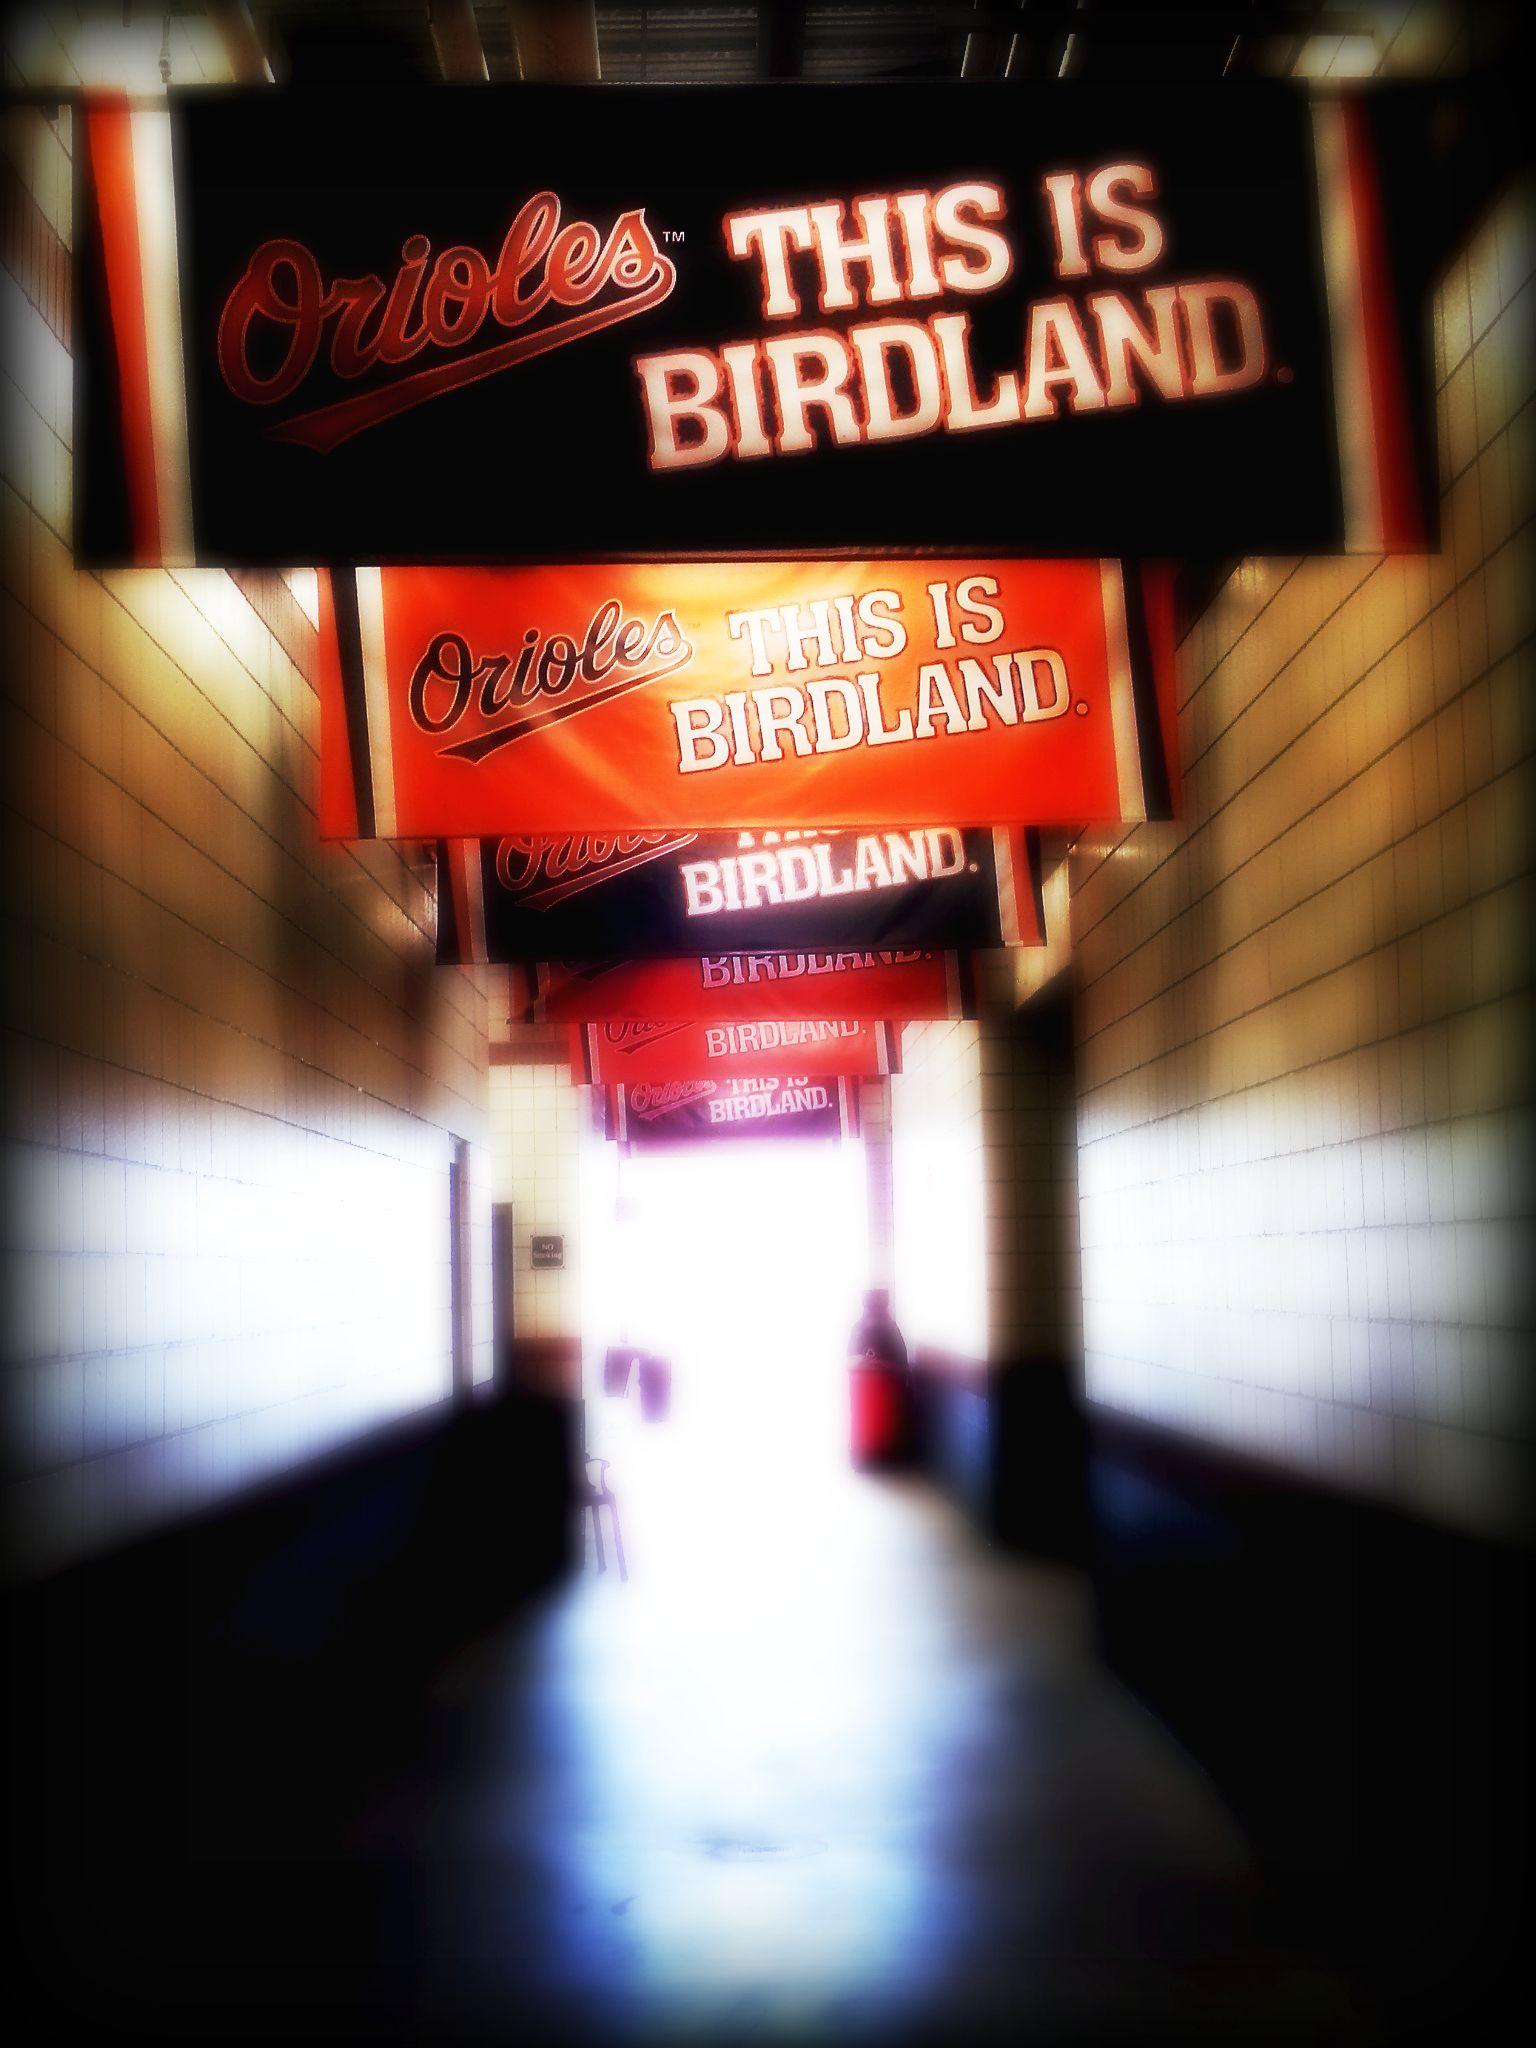 Birdland Hall Baltimore Orioles Baseball Orioles Birdland